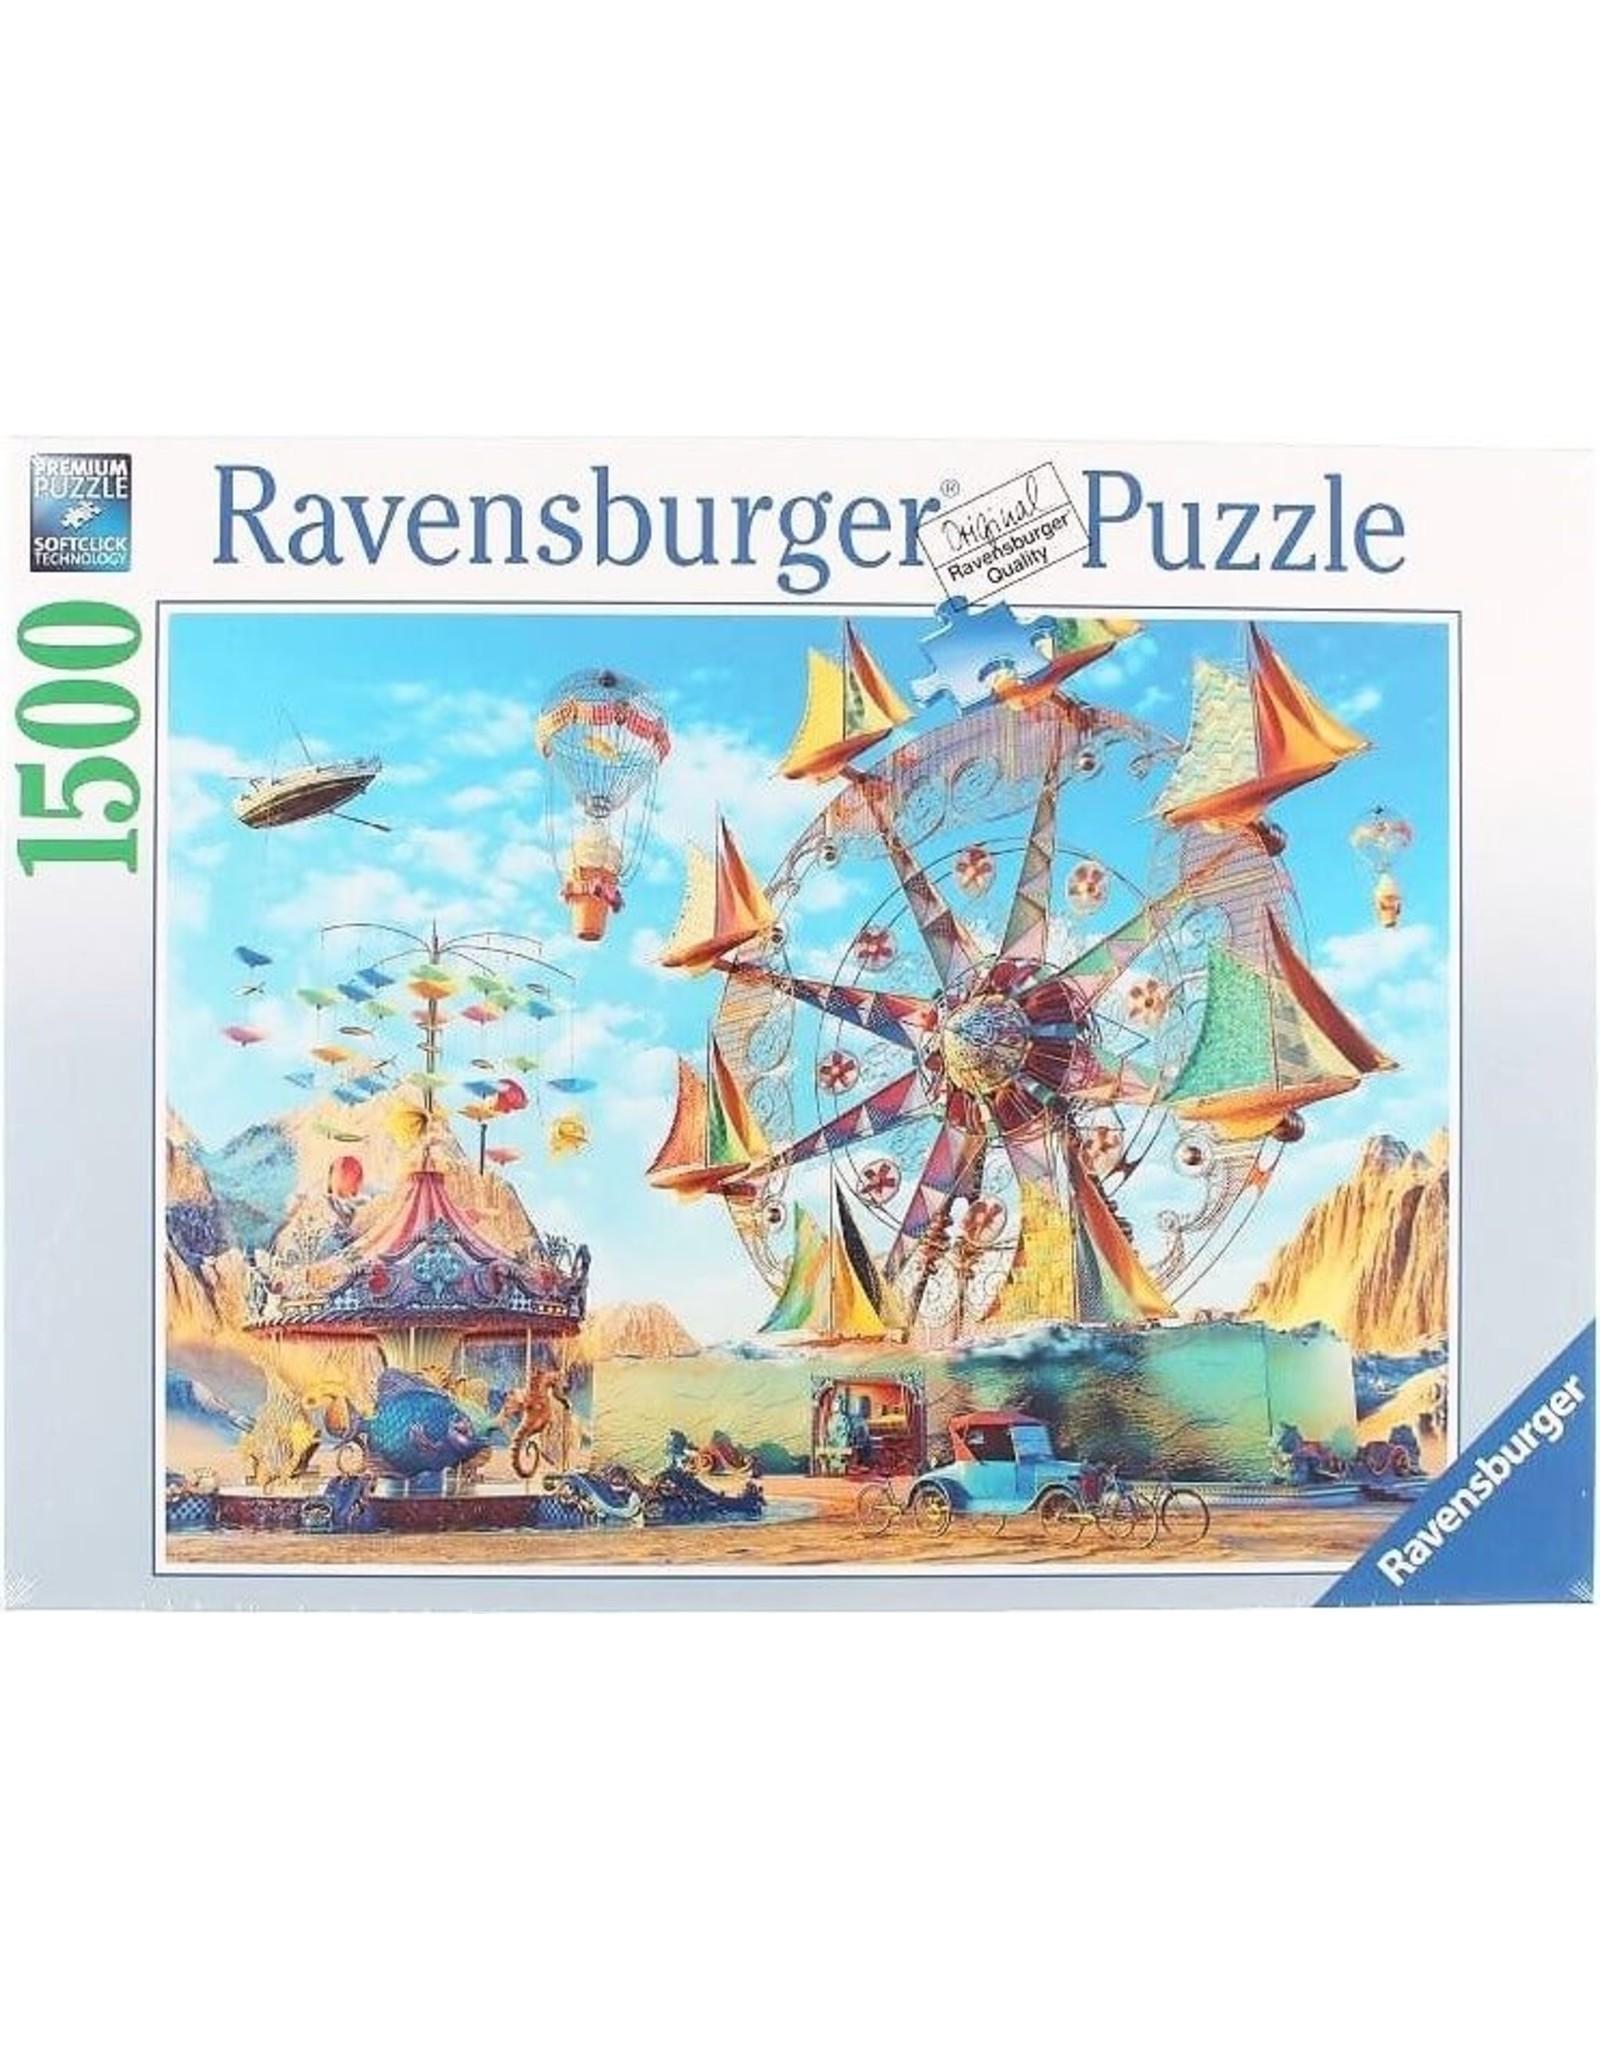 "Ravensburger ""Carnival of Dreams"" 1500 Piece Puzzle"